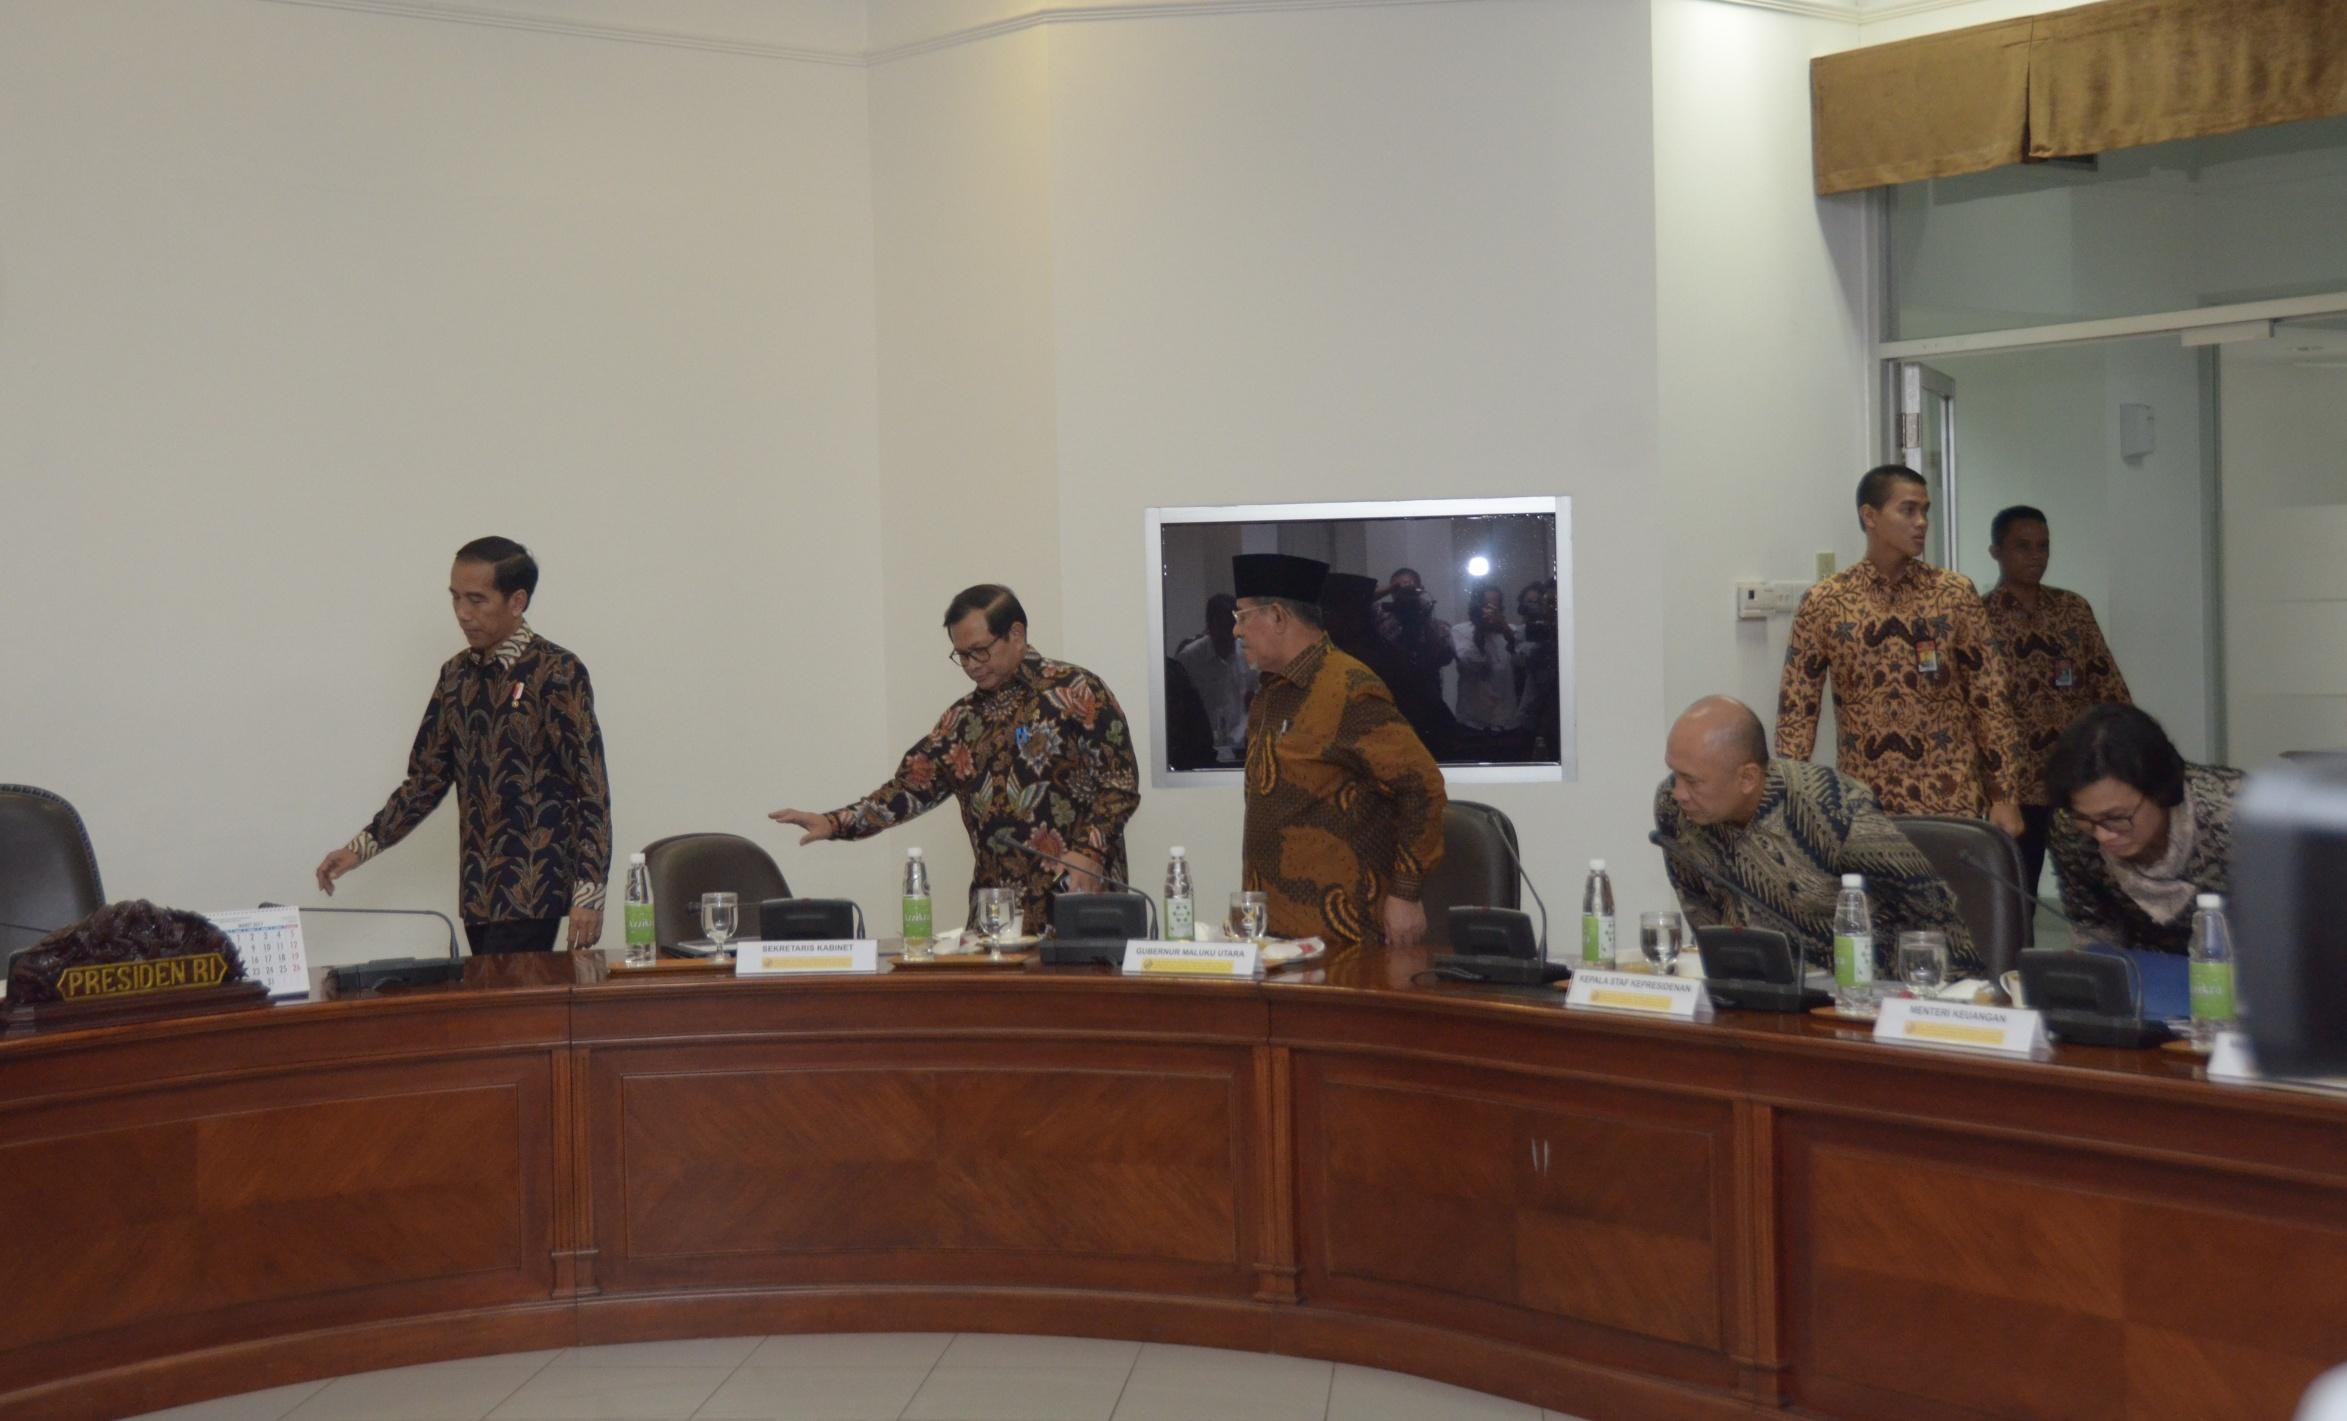 Presiden Jokowi bersiap memimpin rapat terbatas yang dihadiri oleh Gubernur Maluku Utara Abdul Ghani Kasuba (berpeci), di Kantor Presiden, Jakarta, Selasa (28/2) siang. (Foto: JAY/Humas)